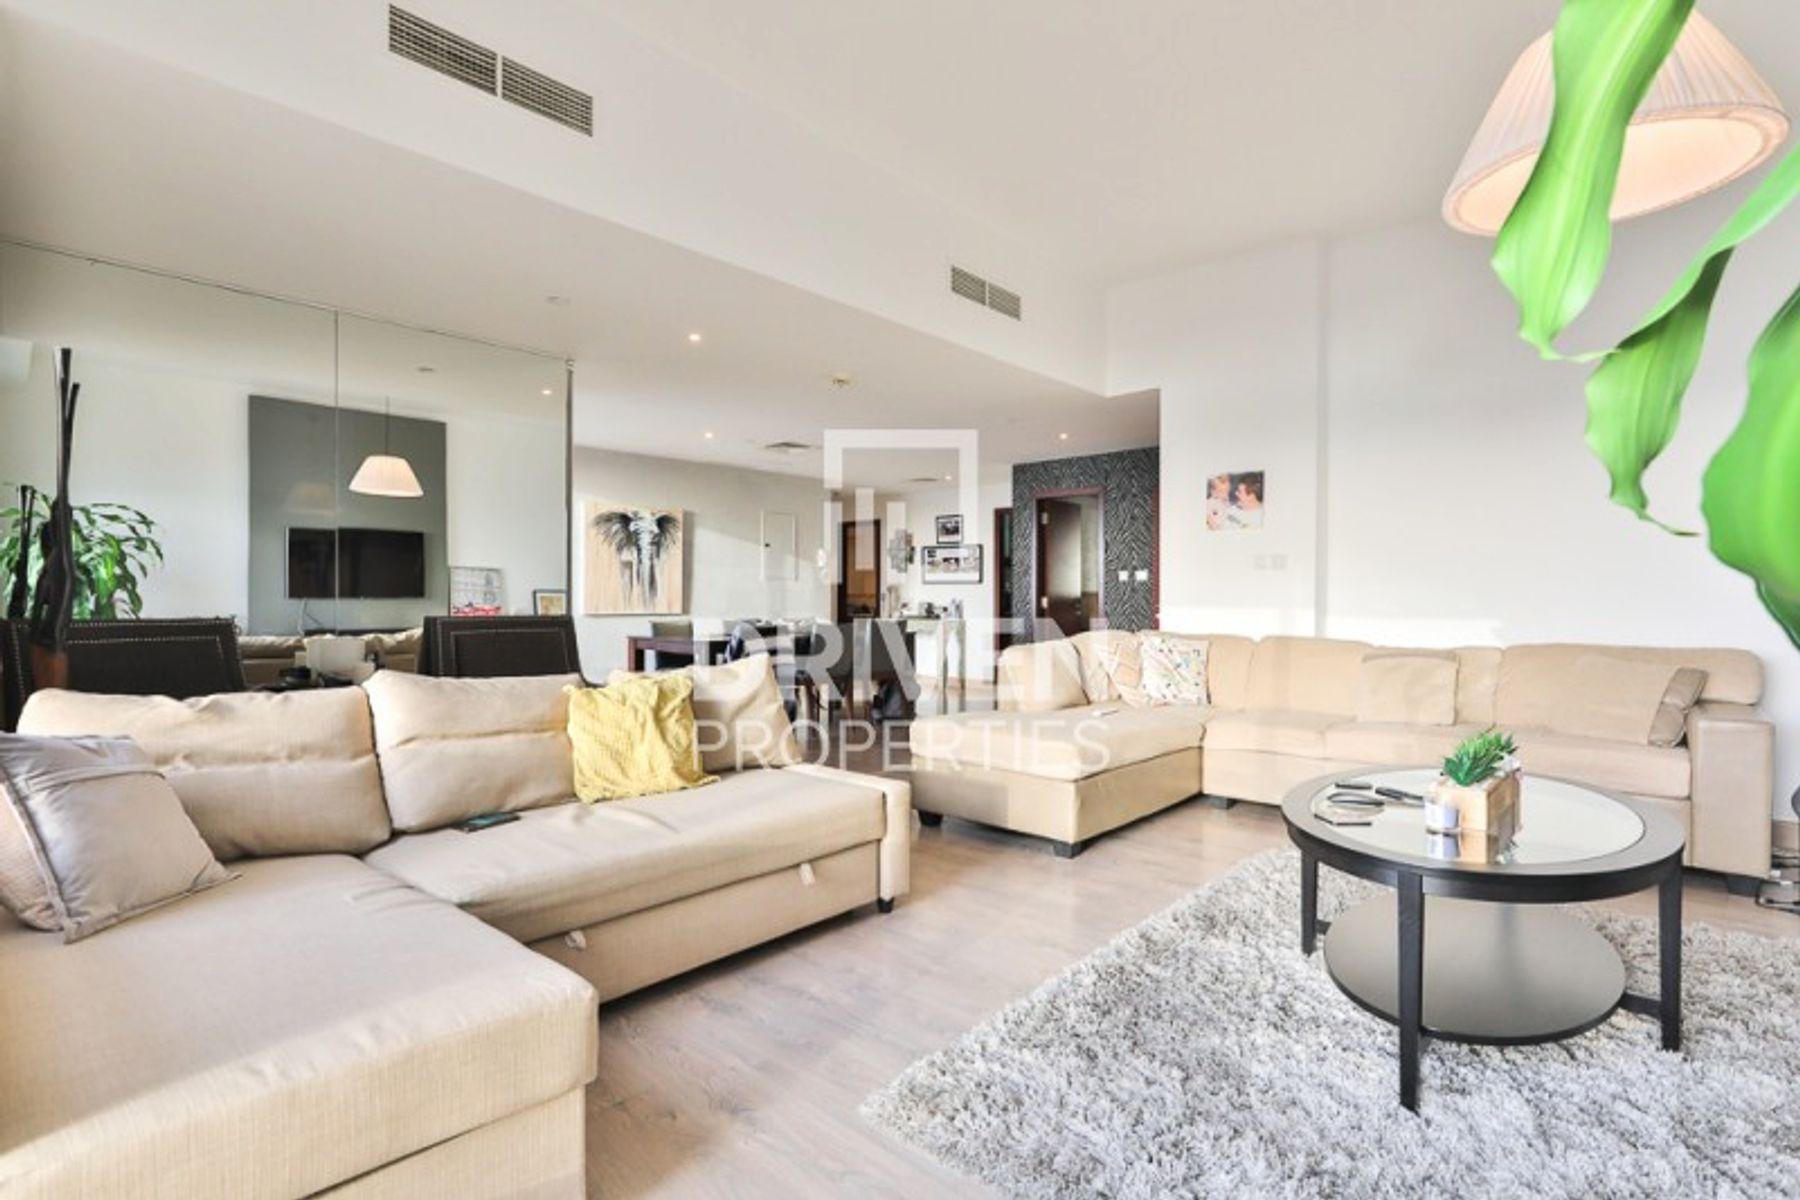 Apartment for Sale in Bahar 4 - Jumeirah Beach Residence